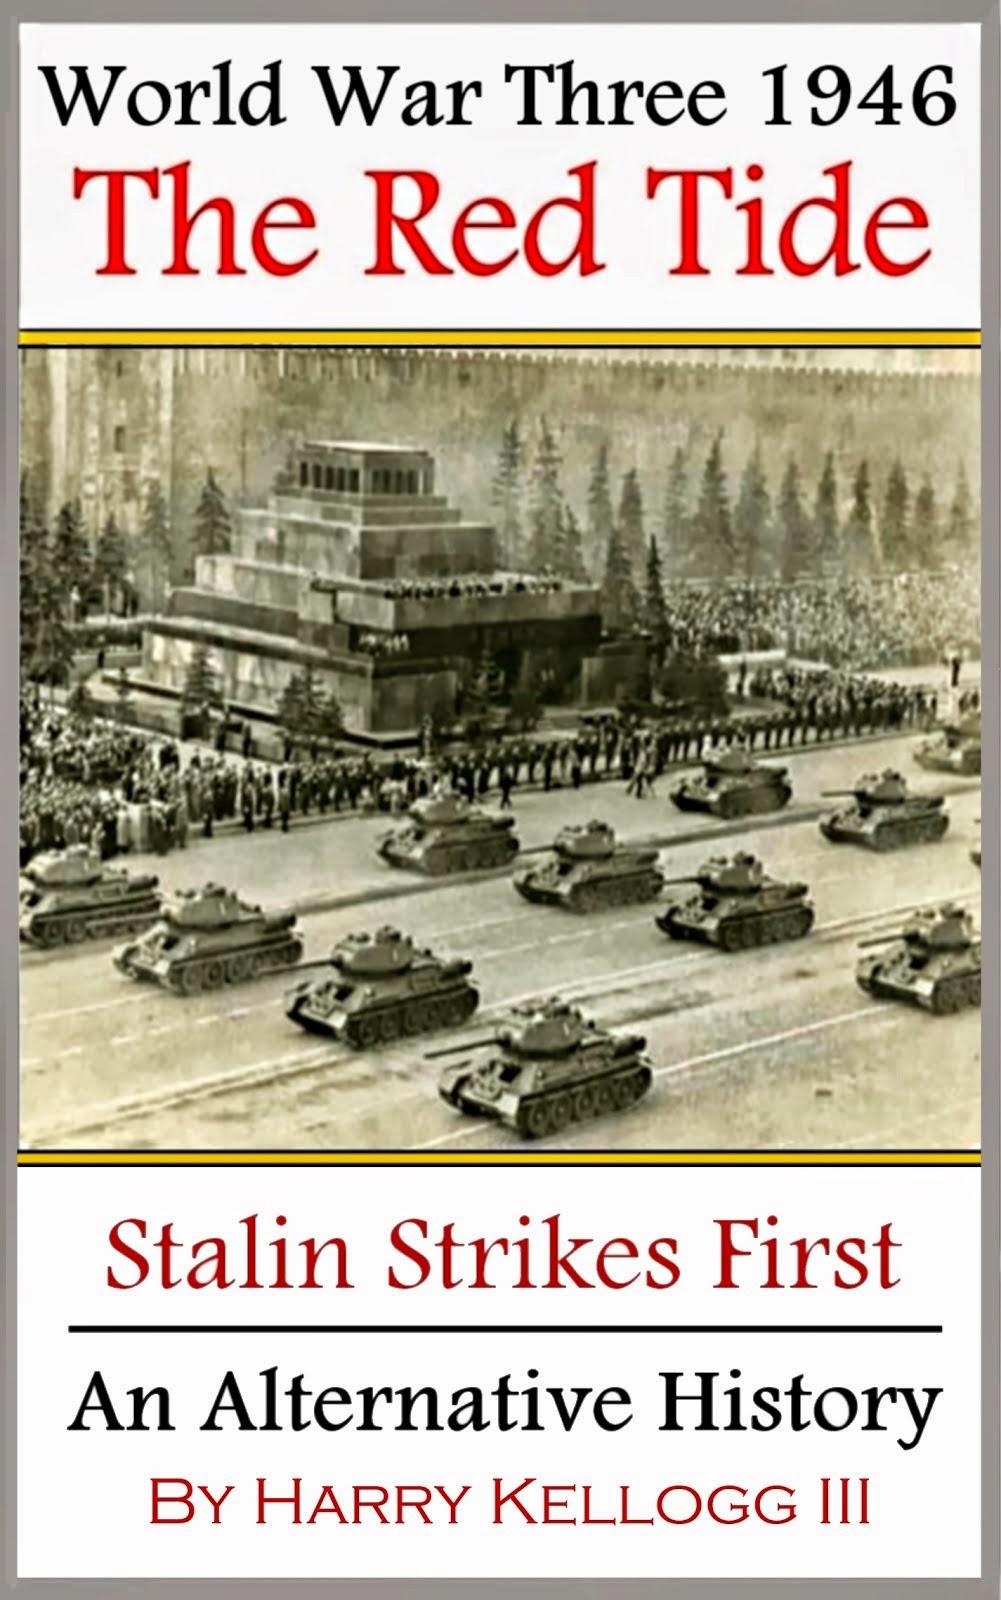 World War Three 1946 - The Red Tide - Stalin Strikes First